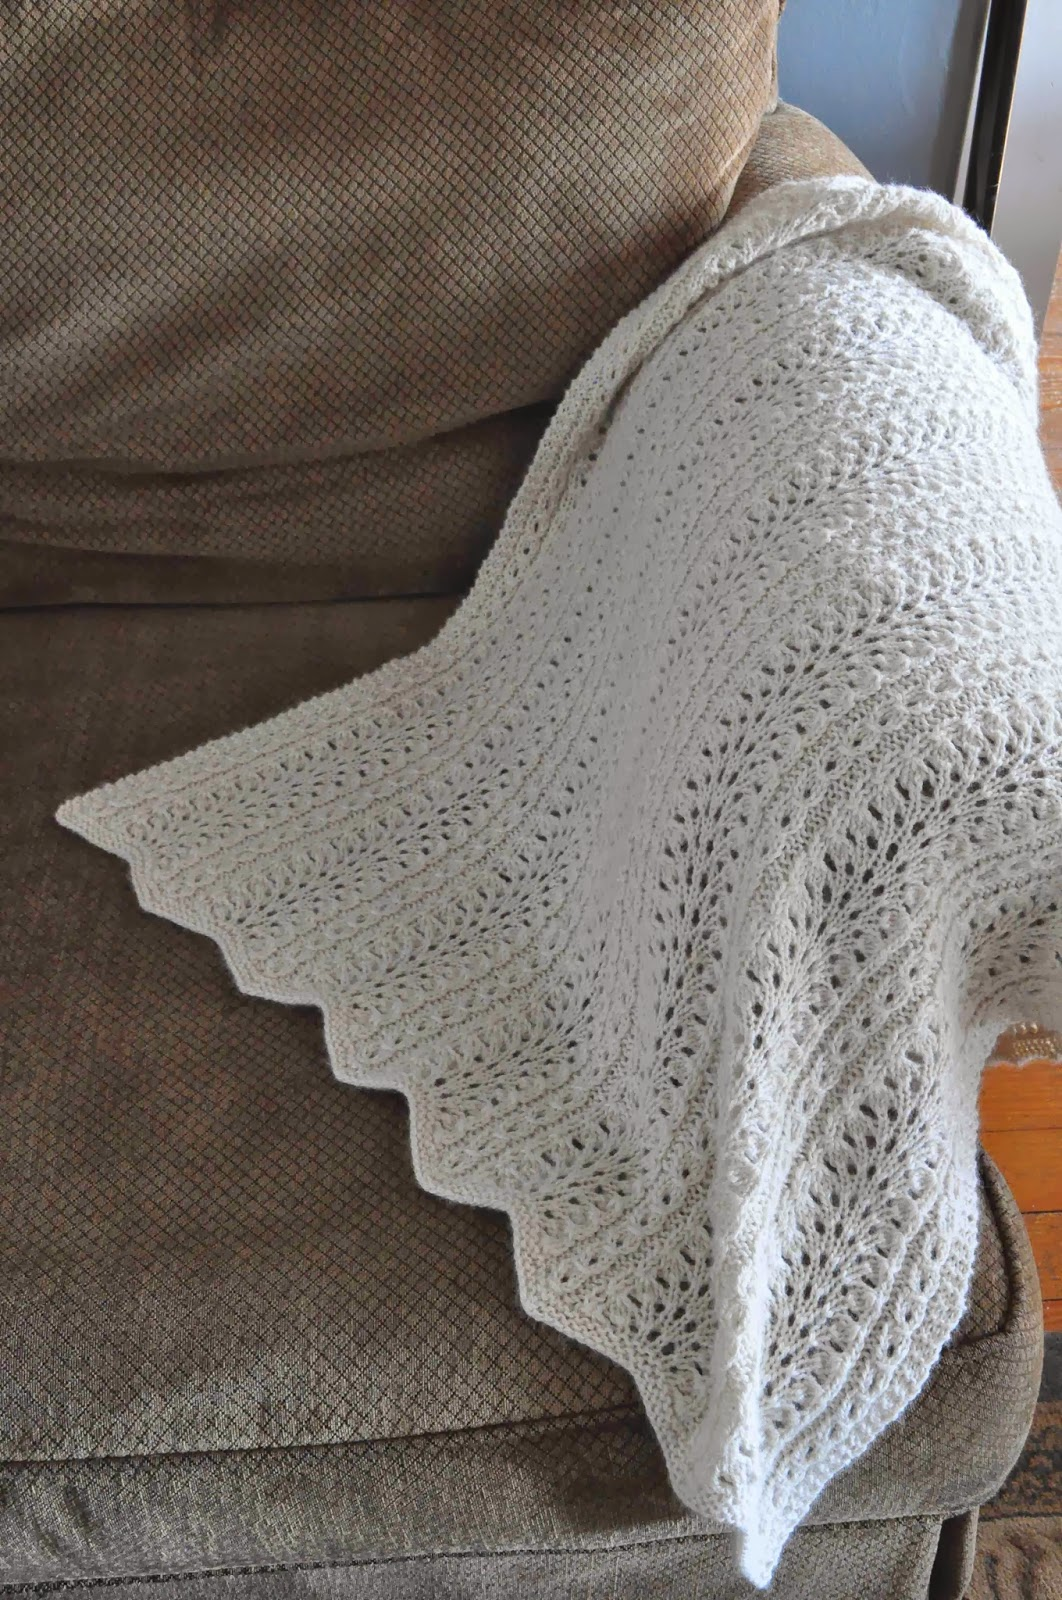 Arrow Acres Farm Hand Knit Alpaca Blanket